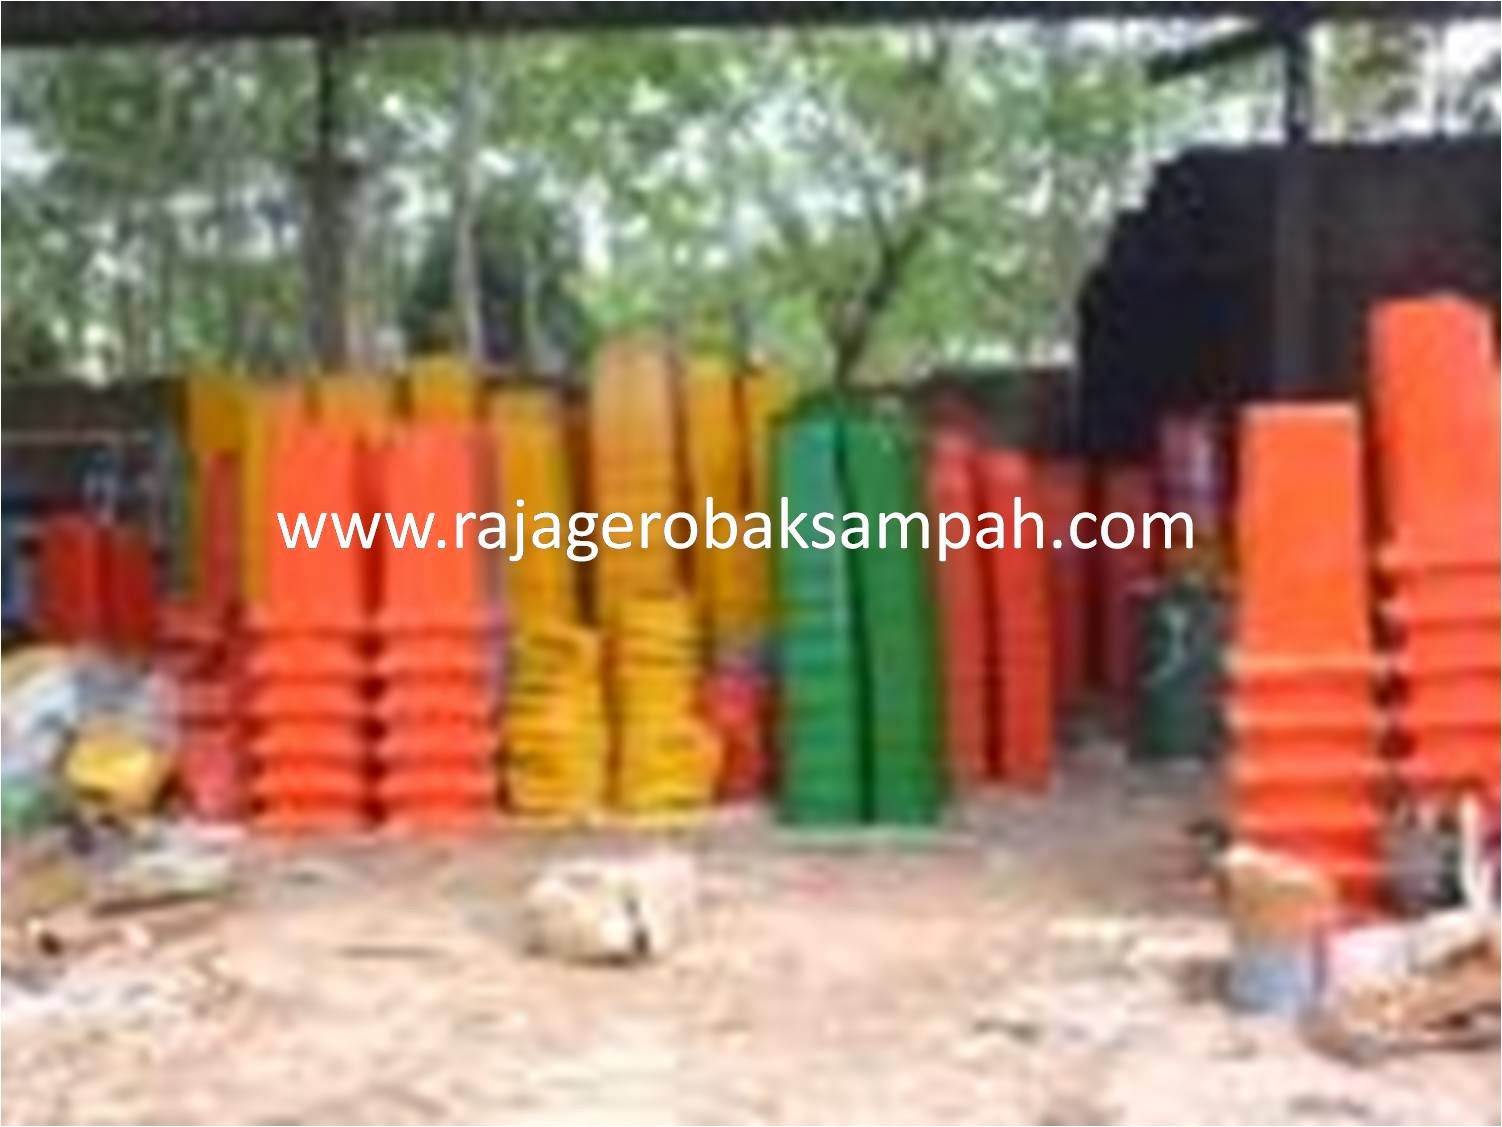 Tong sampah fiber Murah |Tong sampah fiberglass |Tong sampah fiberglass murah | distributor tong sampah fiber | Harga tong sampah fiber | harga tong sampah fiberglass | jual tong sampah fiber | pabrik tong sampah fiber | tong sampah dari fiber | tong sampah fiber murah di Jakarta| tong sampah fiberglass | harga tong sampah fiberglass | cara membuat tong sampah fiberglass | jual tong sampah fiberglass | tong sampah beroda | harga tong sampah beroda tertutup